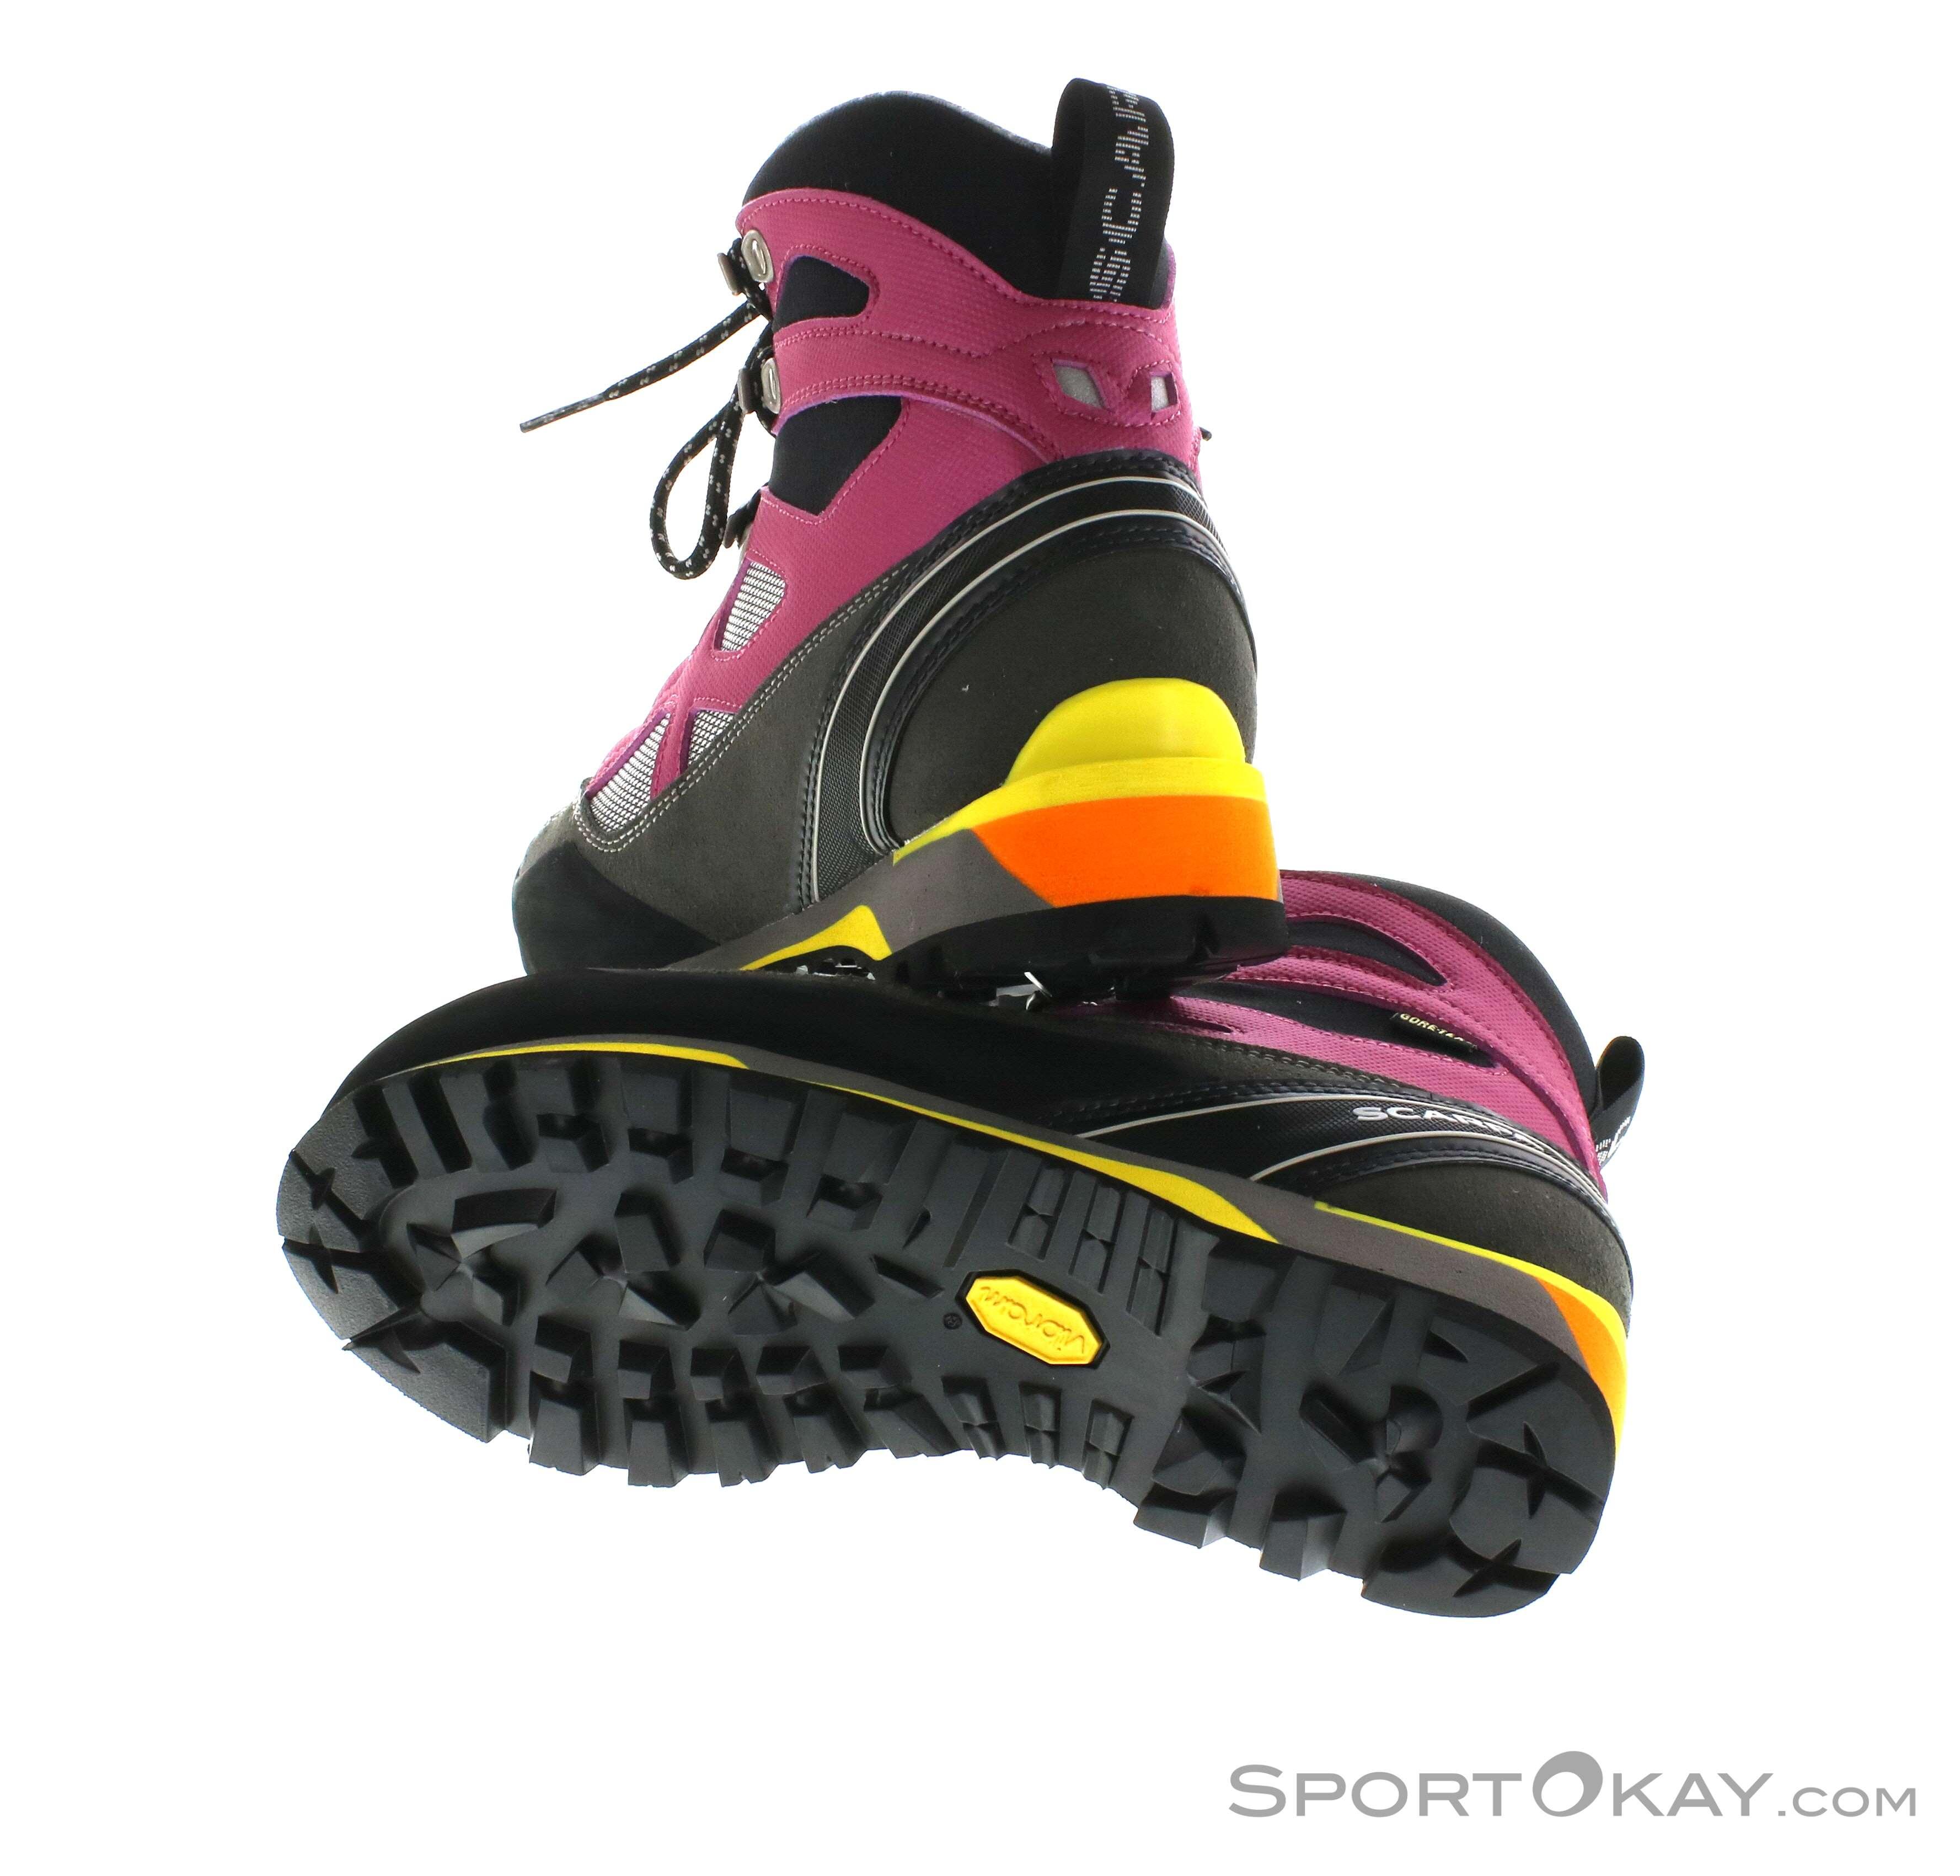 buy online cfa1b c76c0 Scarpa Scarpa Rebel Lite GTX Womens Hiking Boots Gore-Tex